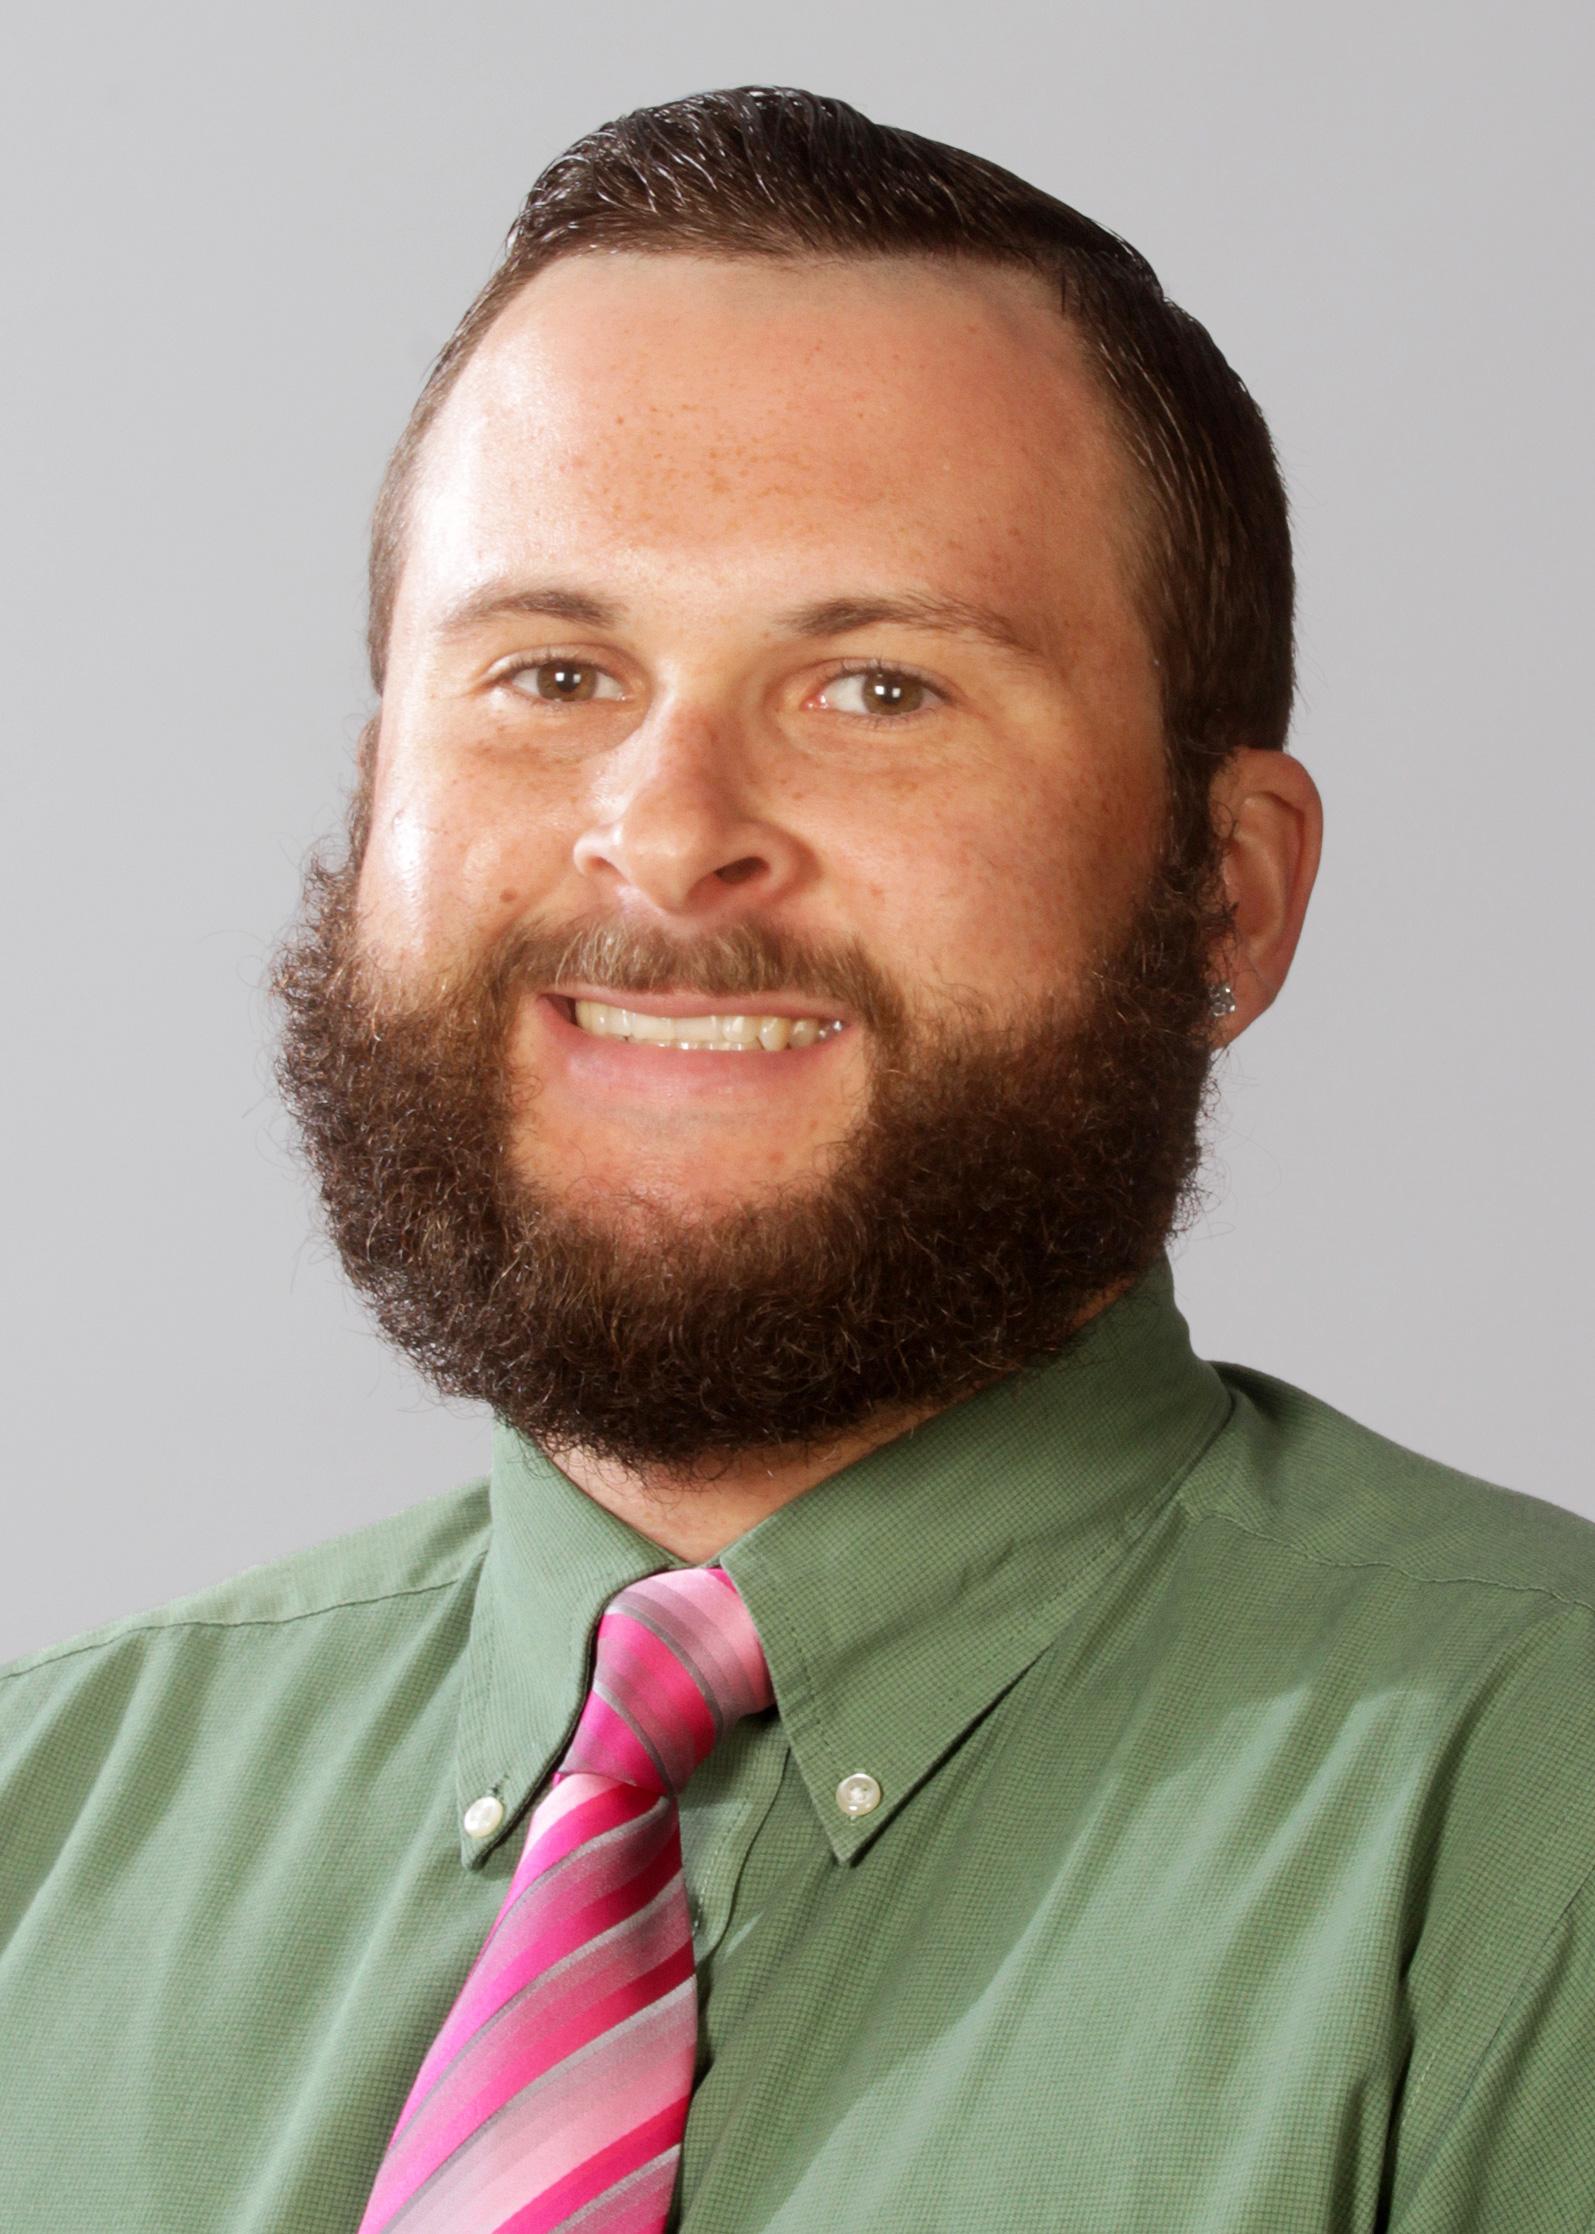 Steve Drasdis